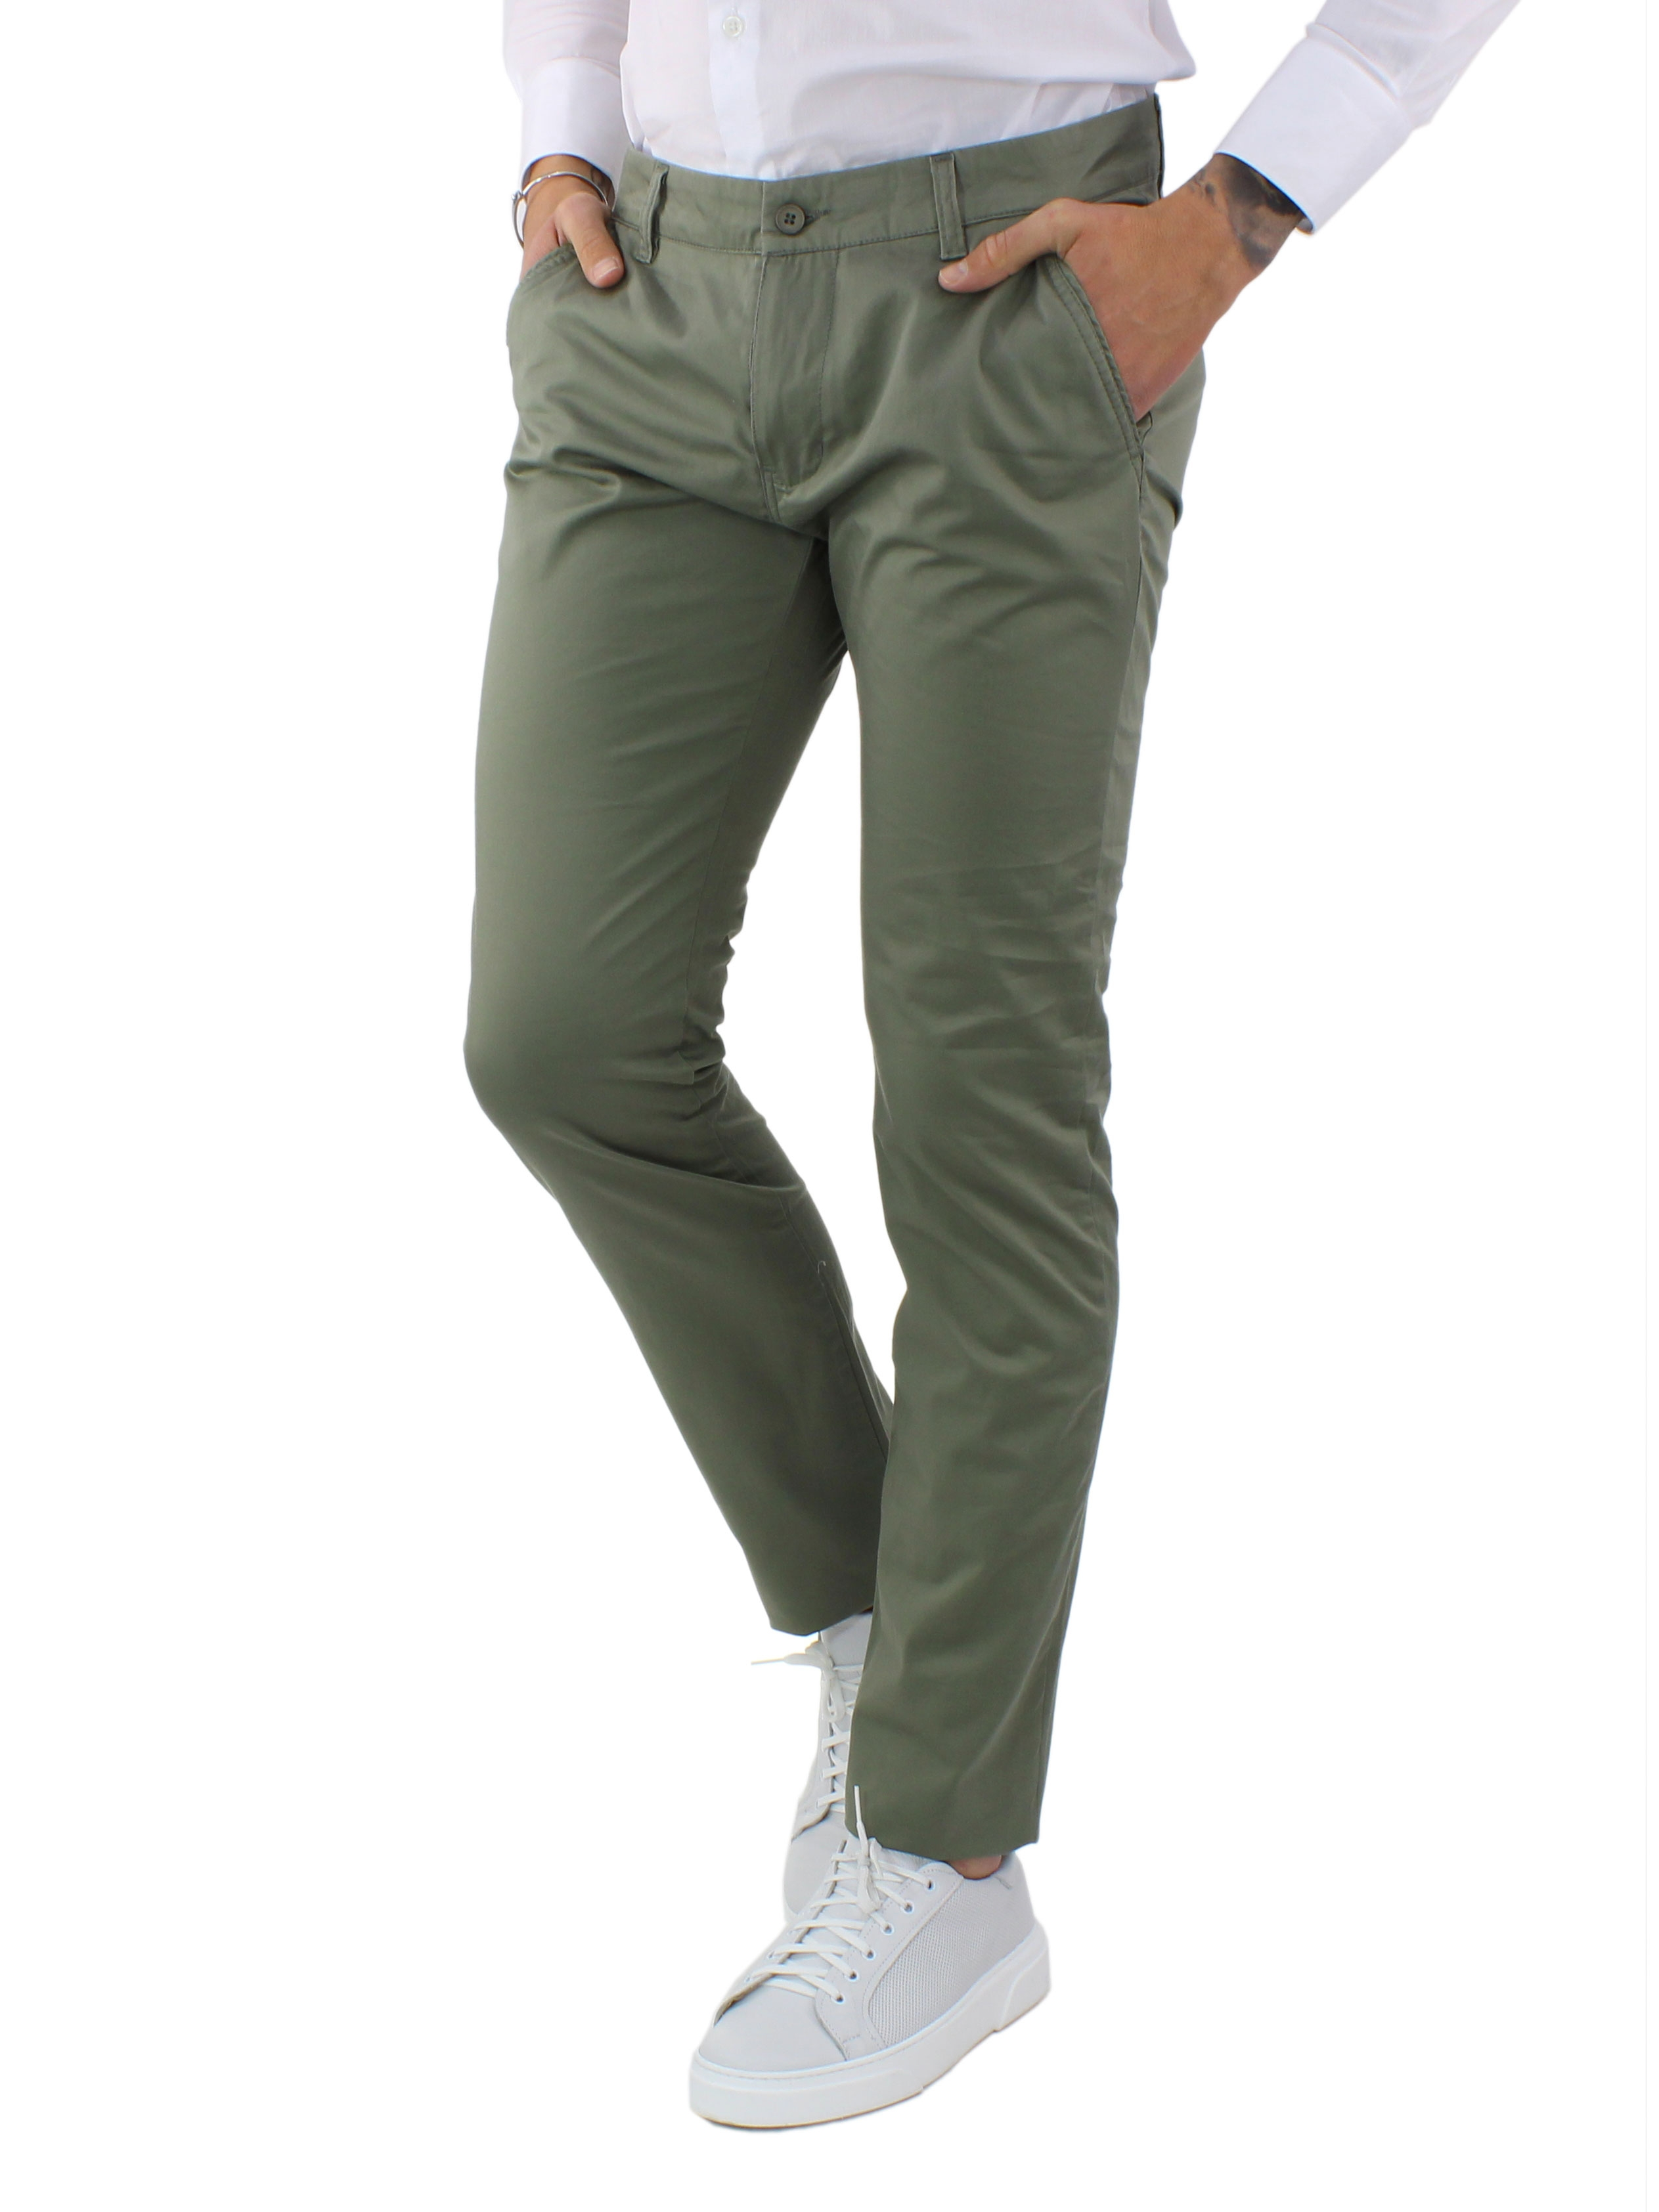 miniature 10 - Pantaloni Uomo Slim Fit Eleganti Primaverili Cotone Pantalone Chino Elasticizzat